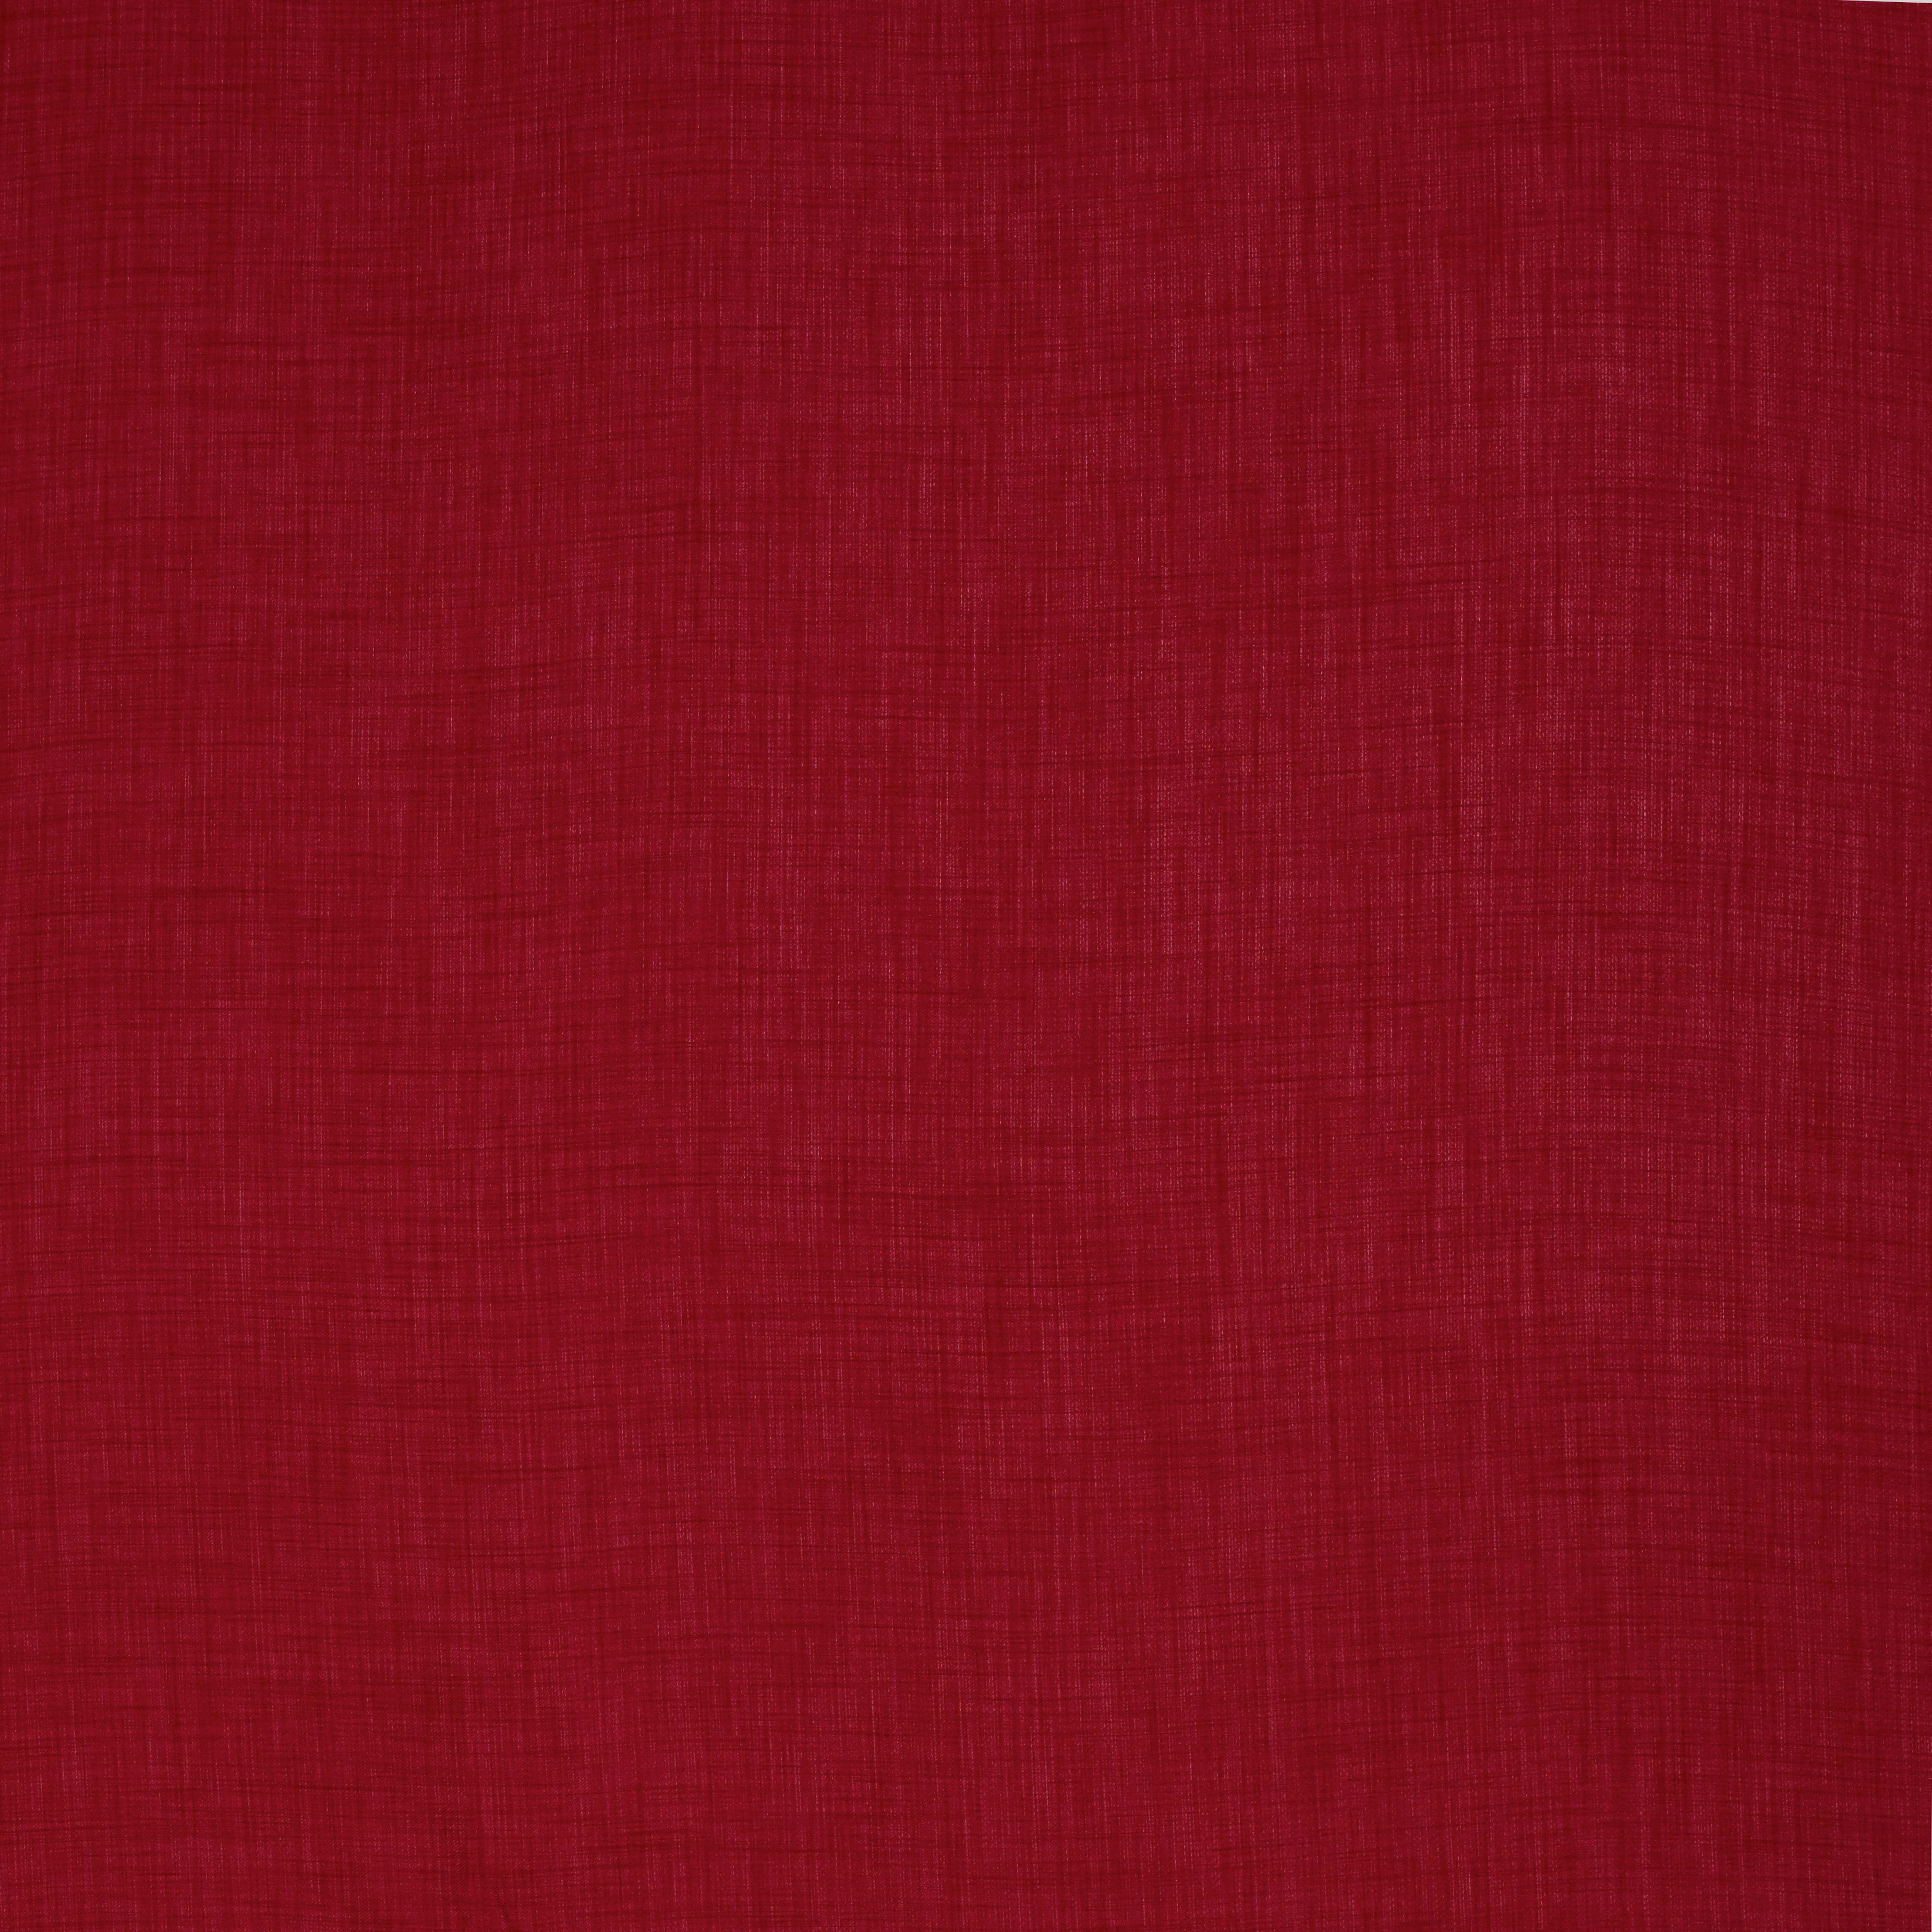 DEKOSTOFF per lfm Verdunkelung - Rot, KONVENTIONELL, Textil (152cm) - ESPOSA